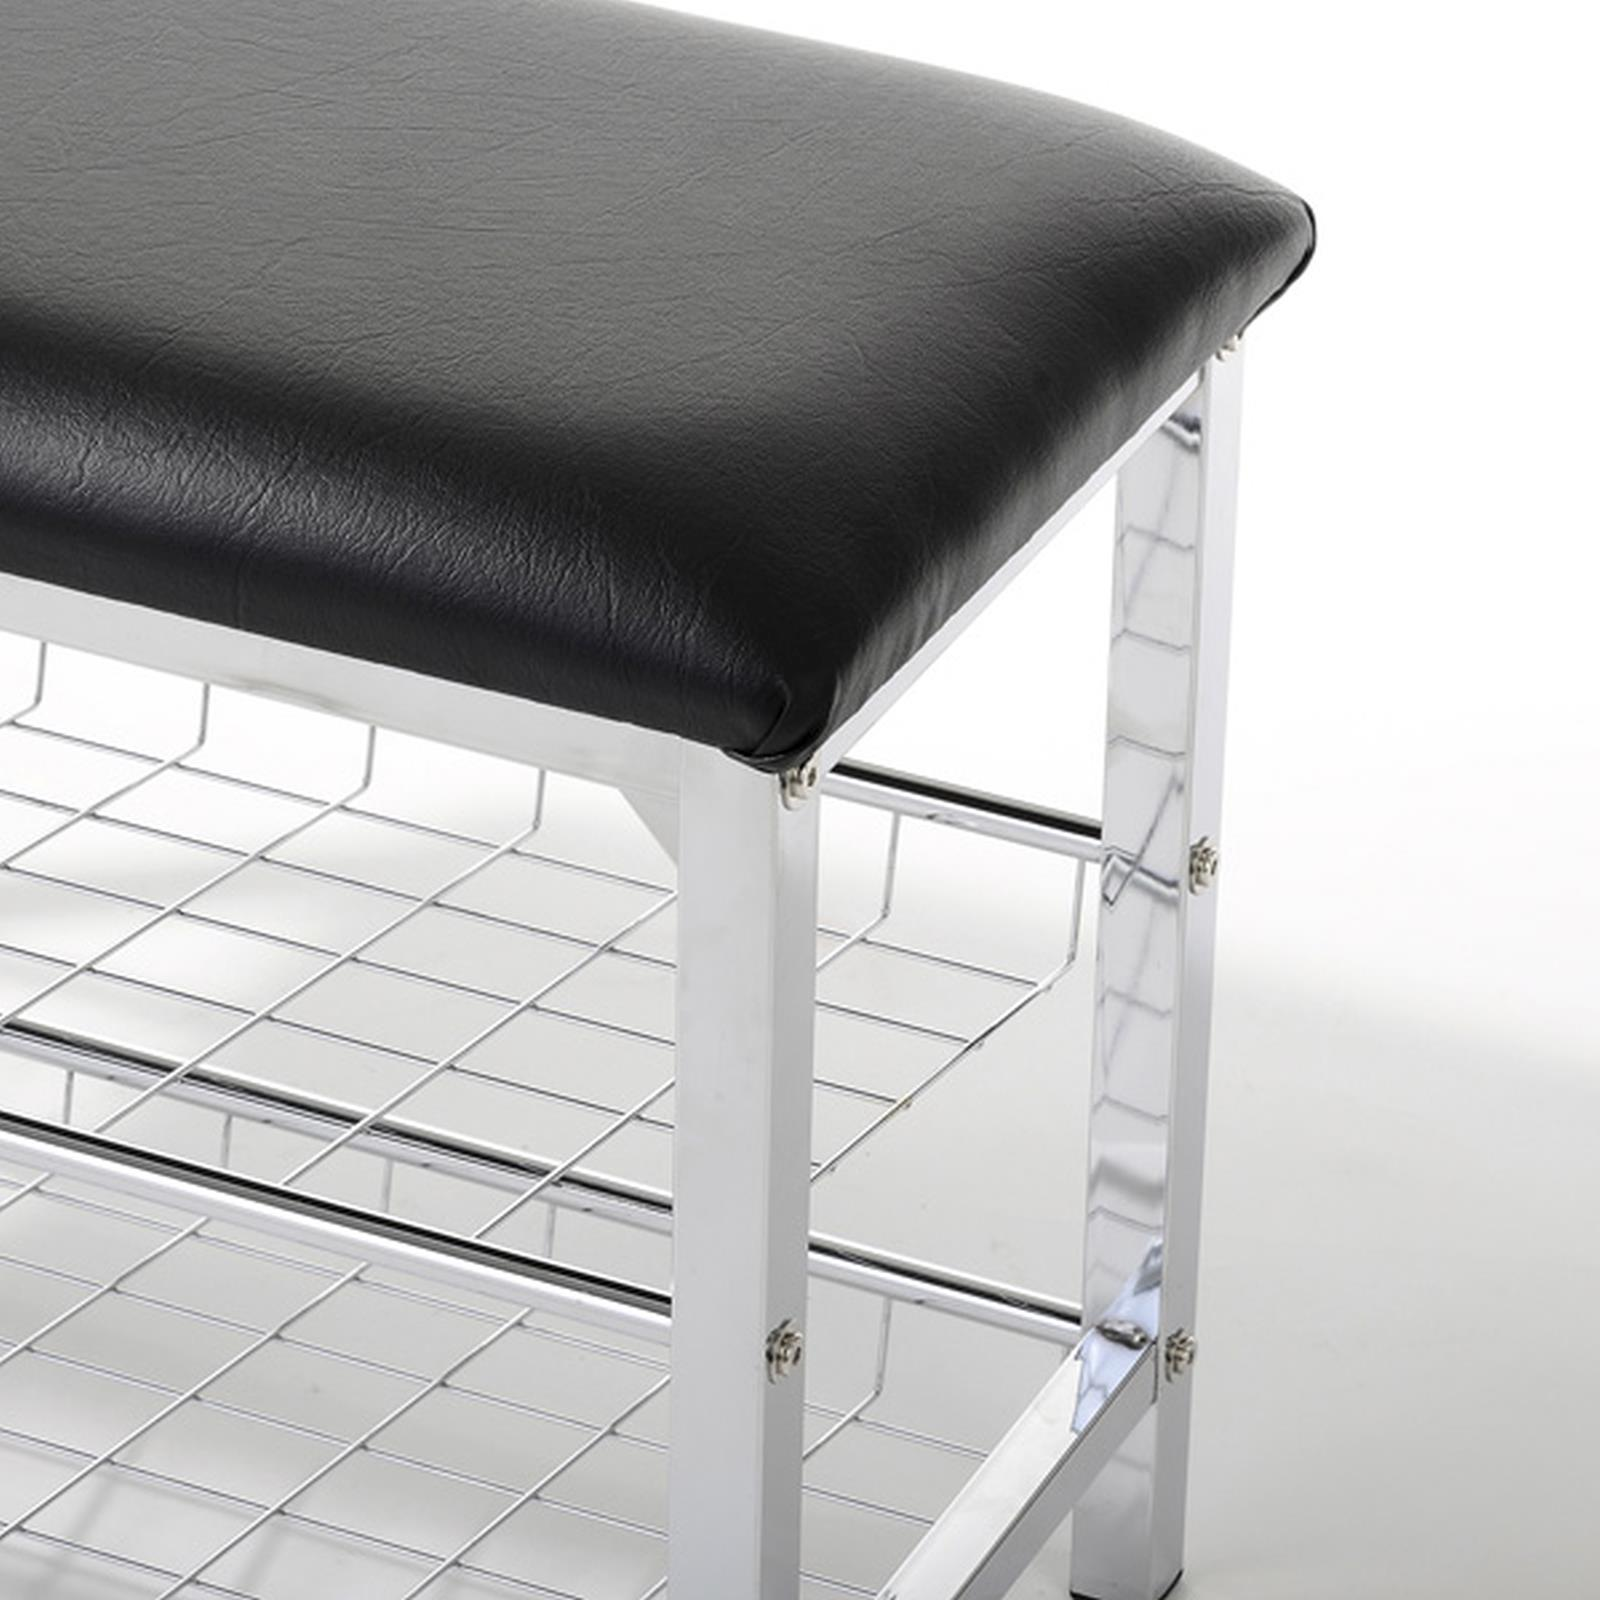 sitzbank mit schuhablage in schwarz caro m bel. Black Bedroom Furniture Sets. Home Design Ideas